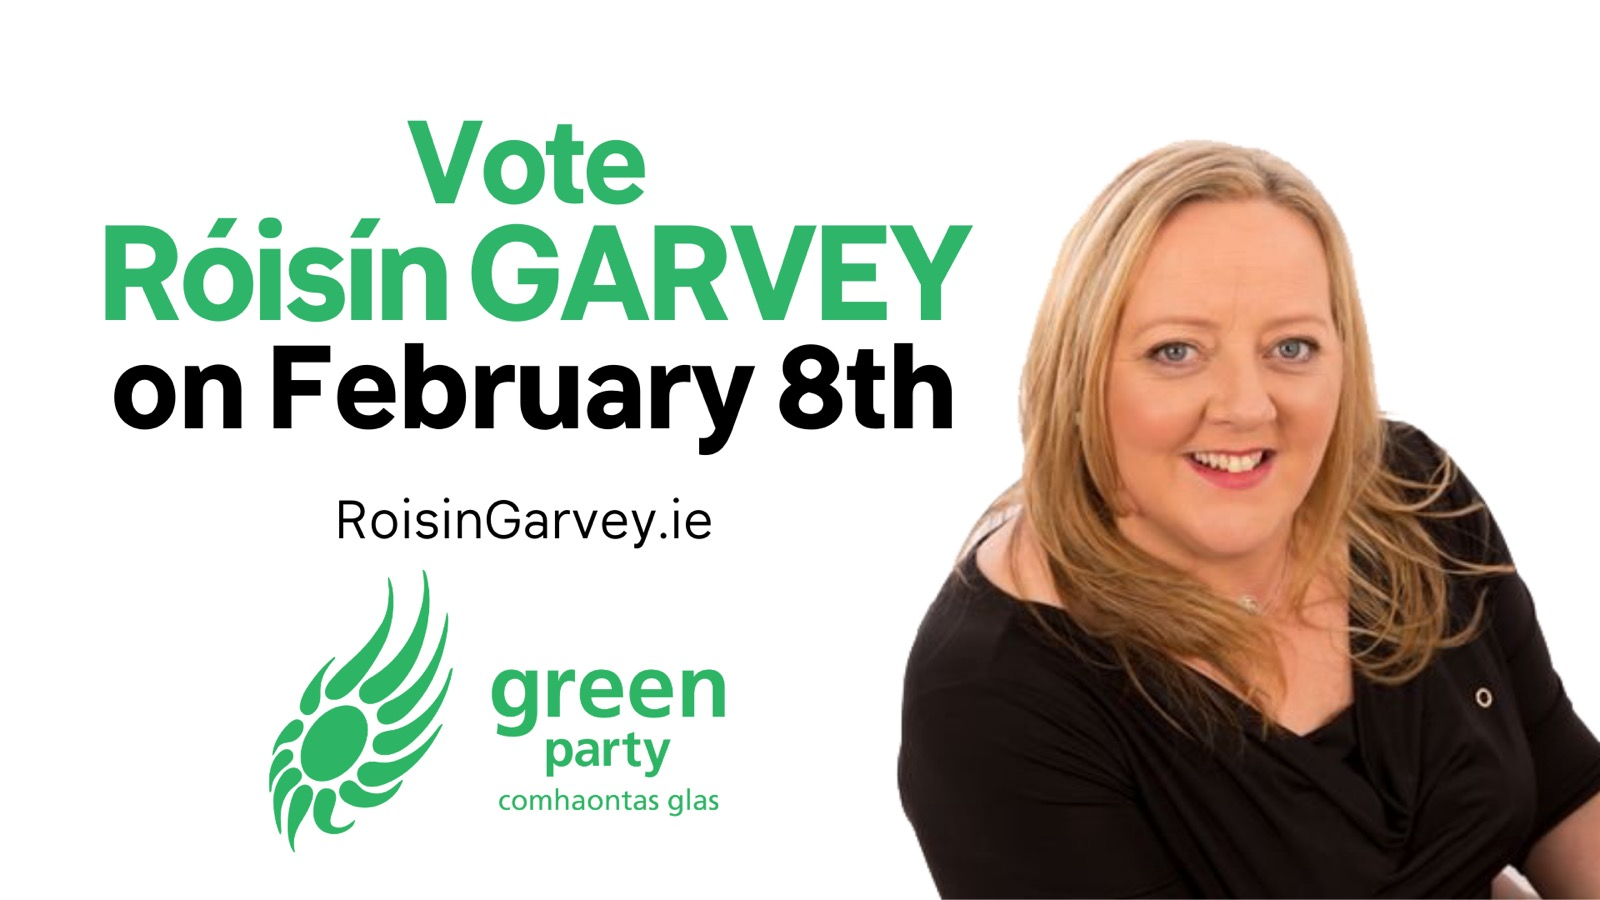 Hello I'm Róisín Garvey